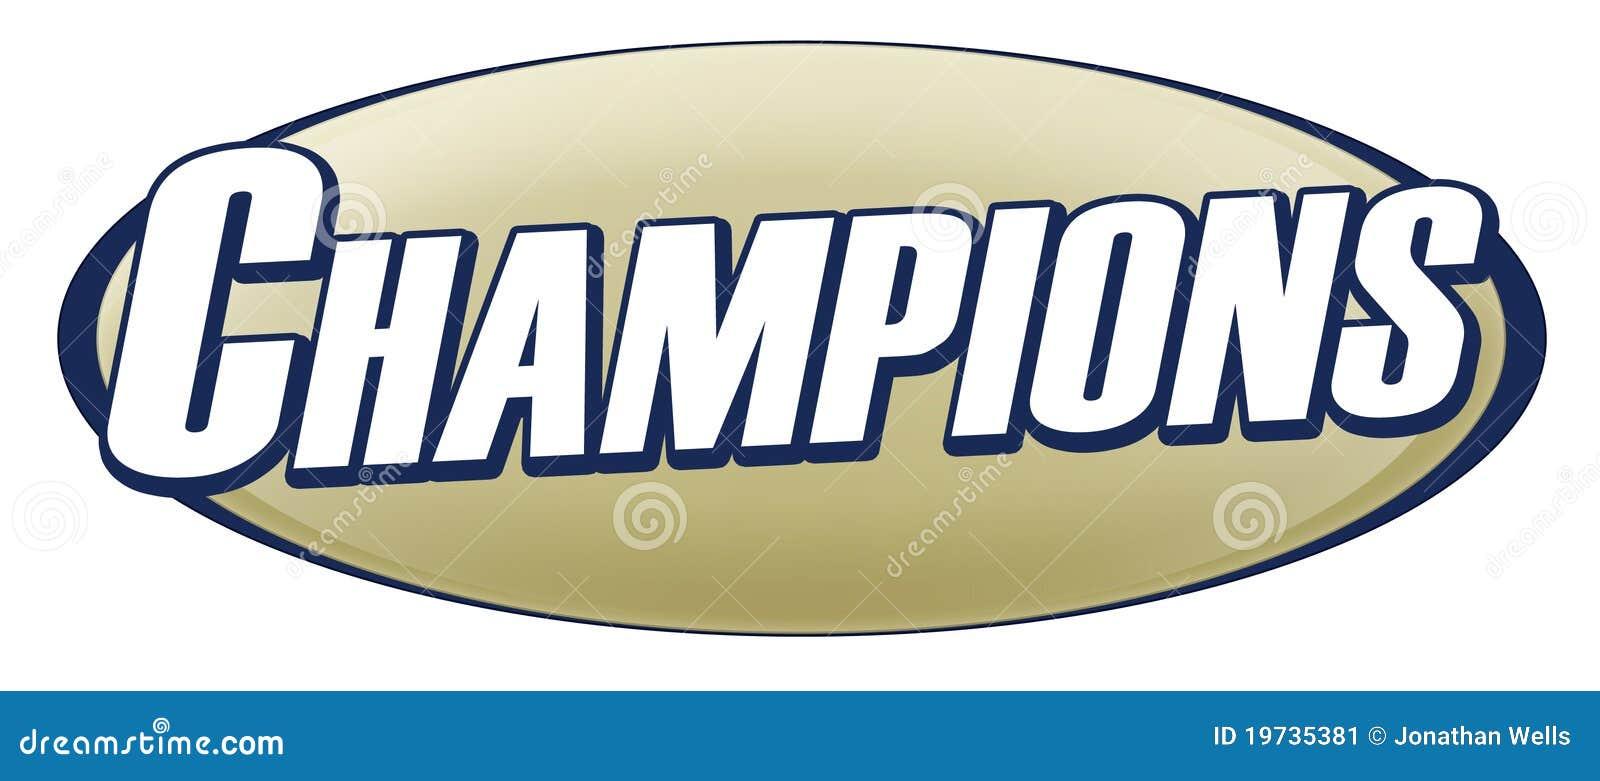 Free Champions